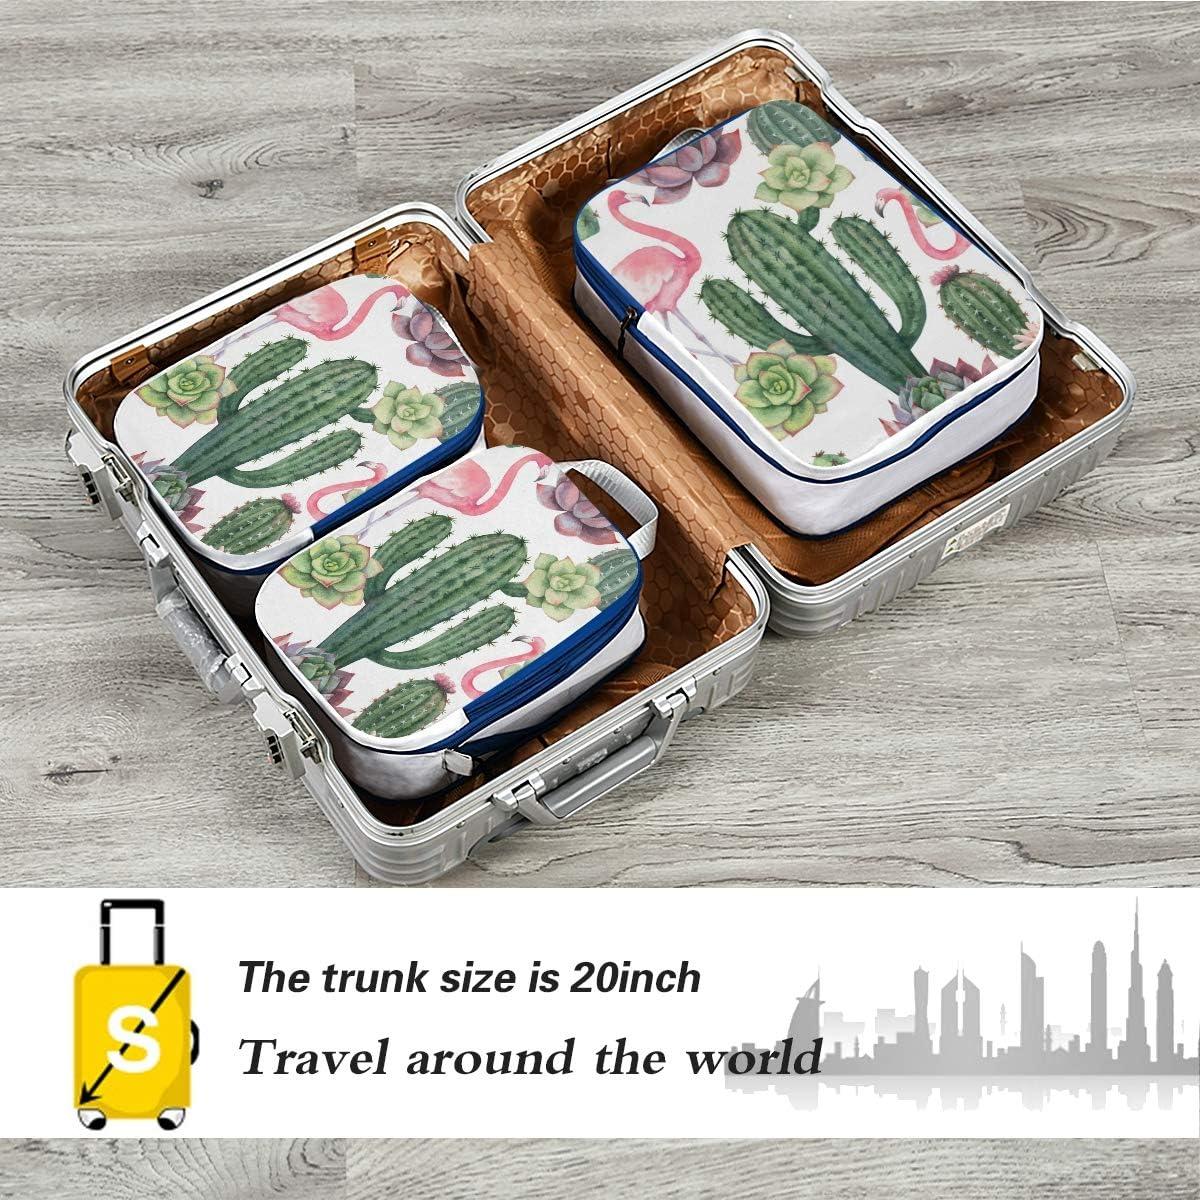 Pink Flamingo With Cacti 3 Set Packing Cubes,2 Various Sizes Travel Luggage Packing Organizers o